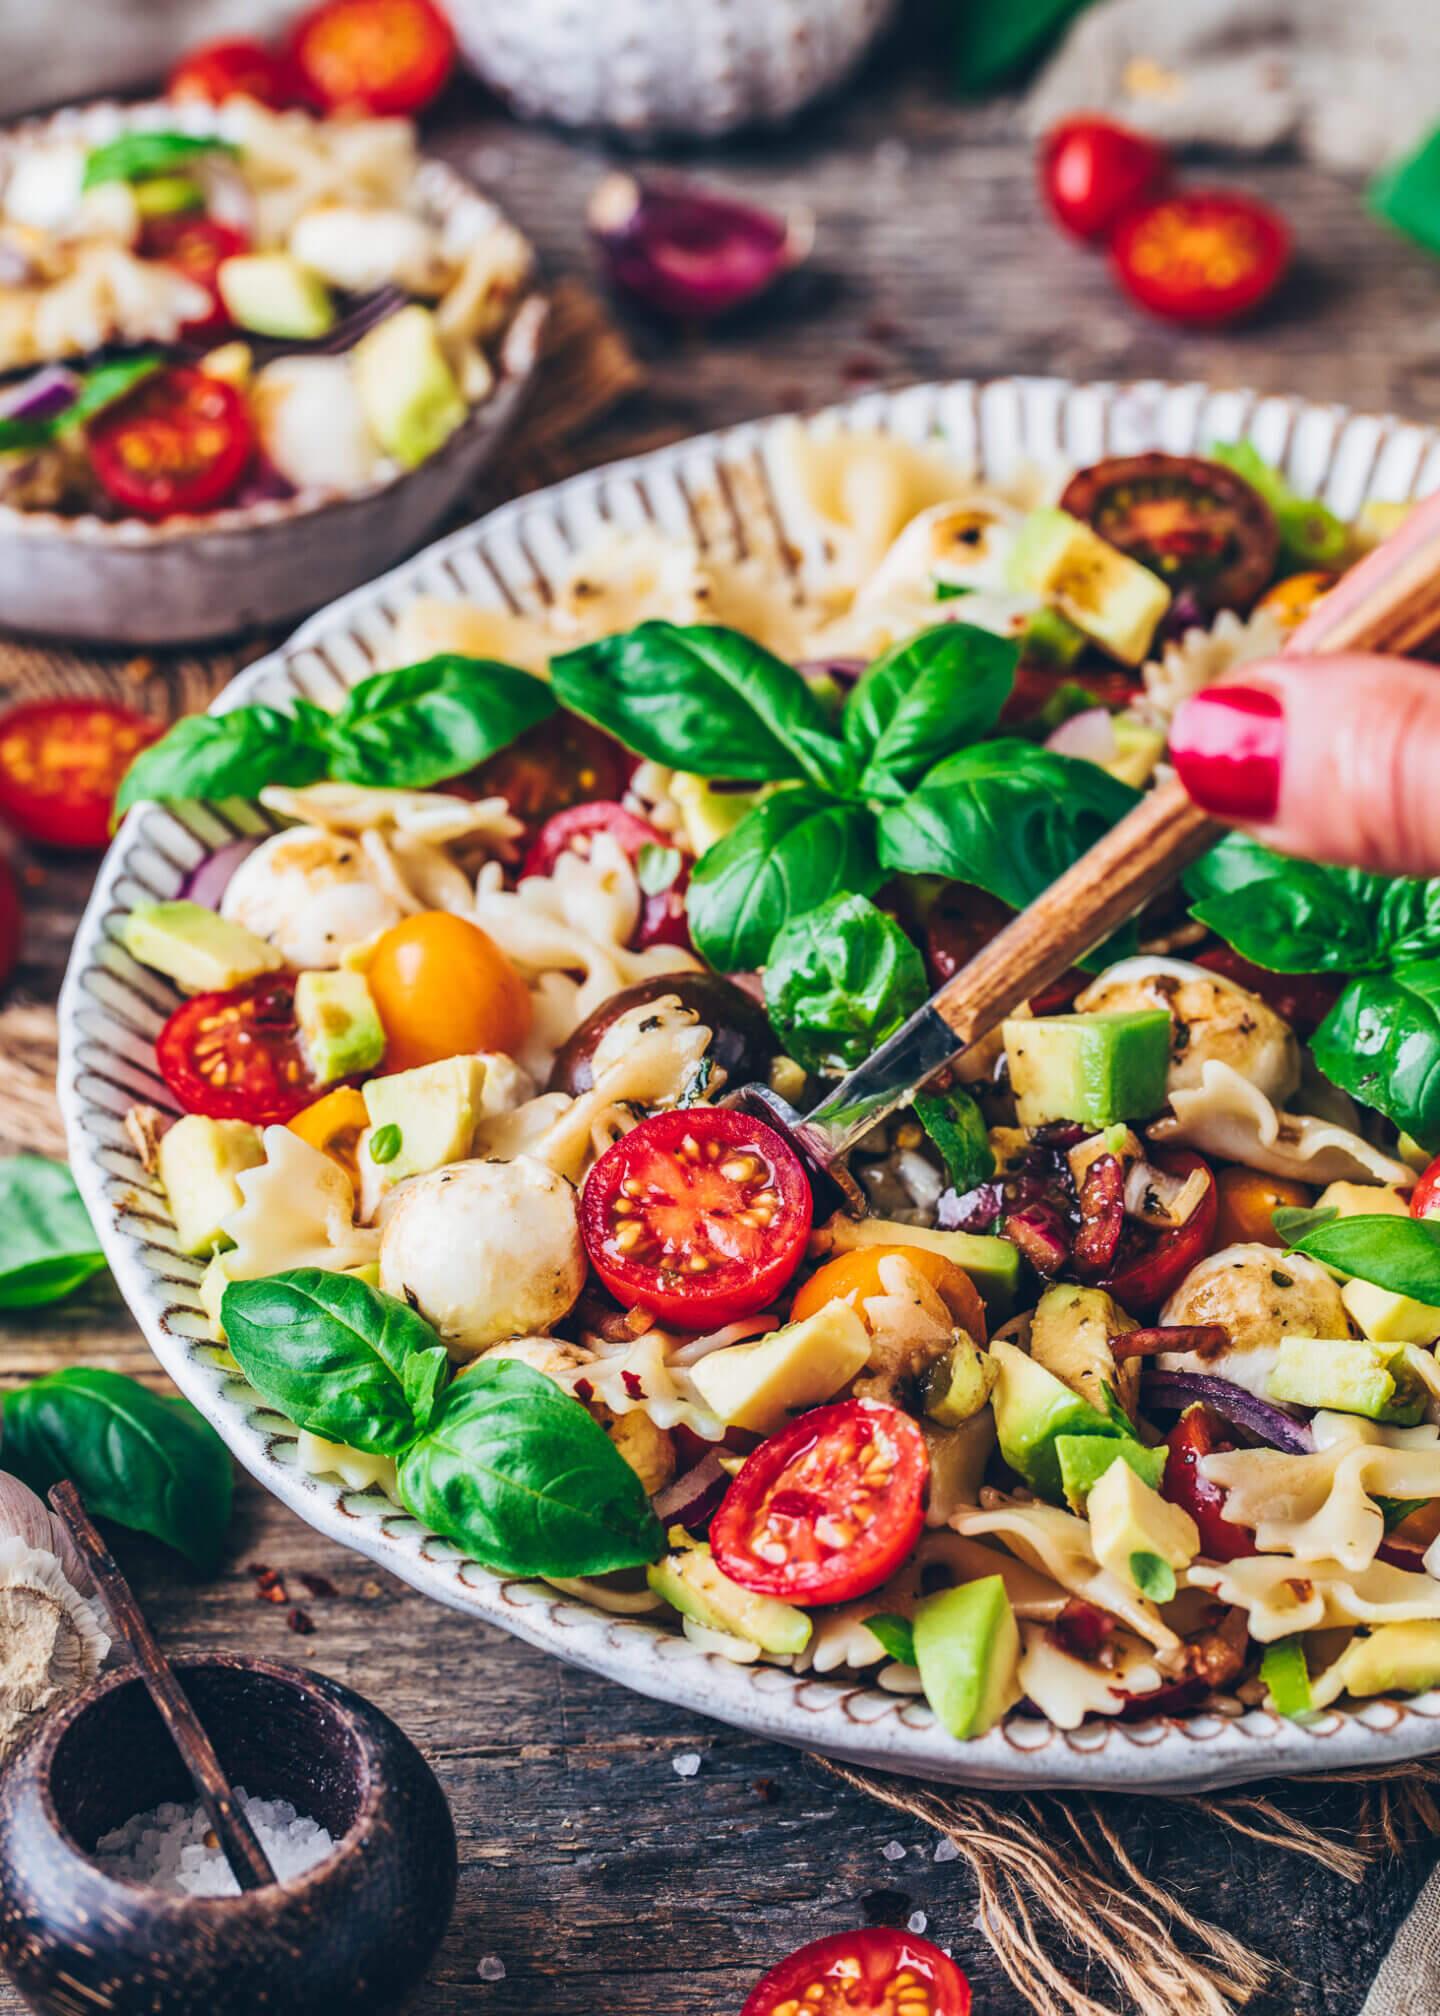 Nudelsalat mit Tomaten, Mozzarella und Balsamico-Dressing (Caprese)